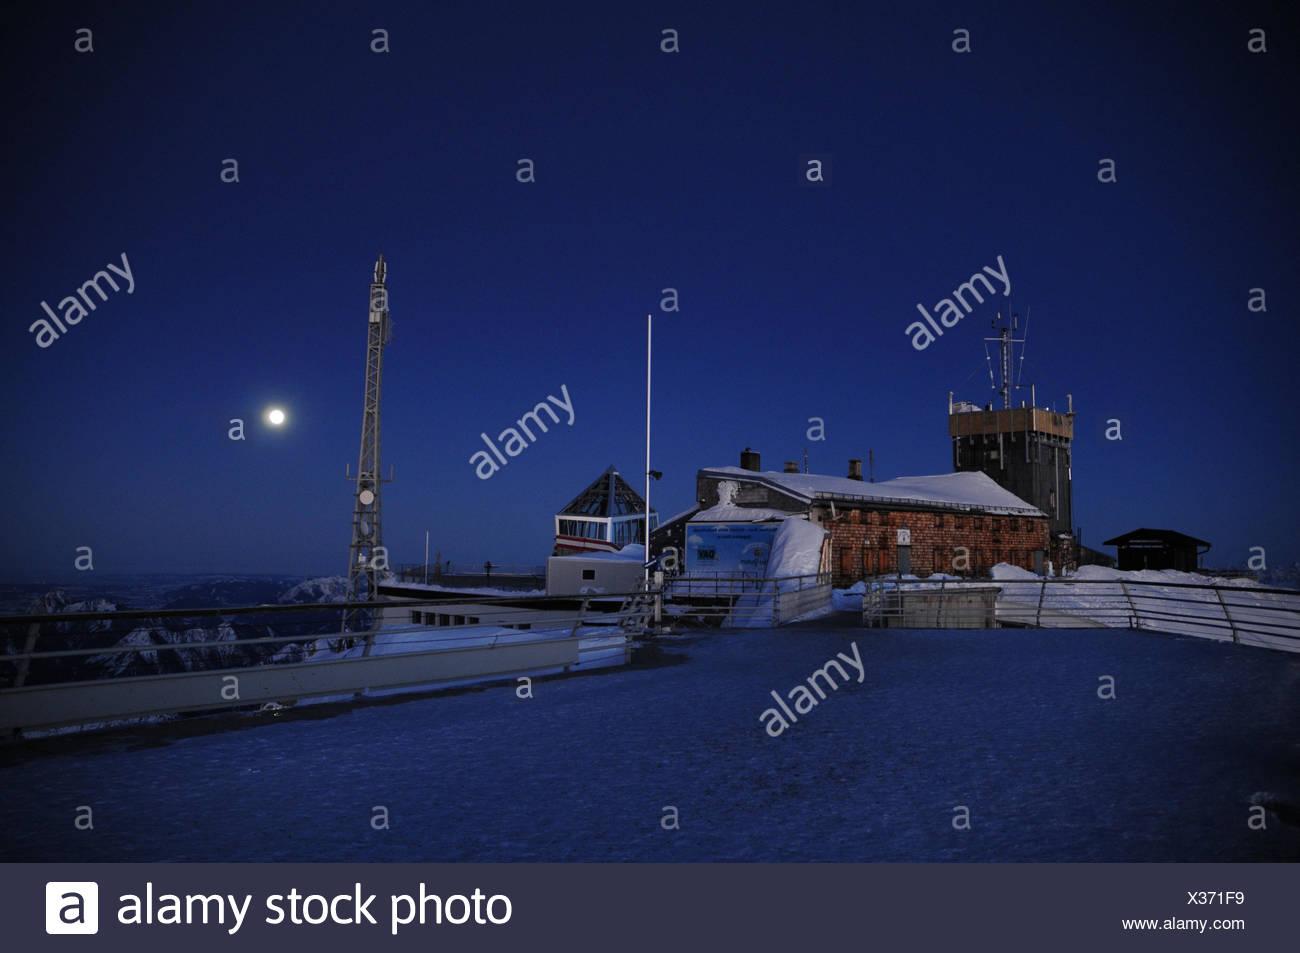 Blue Moon Cafe Upper Lake